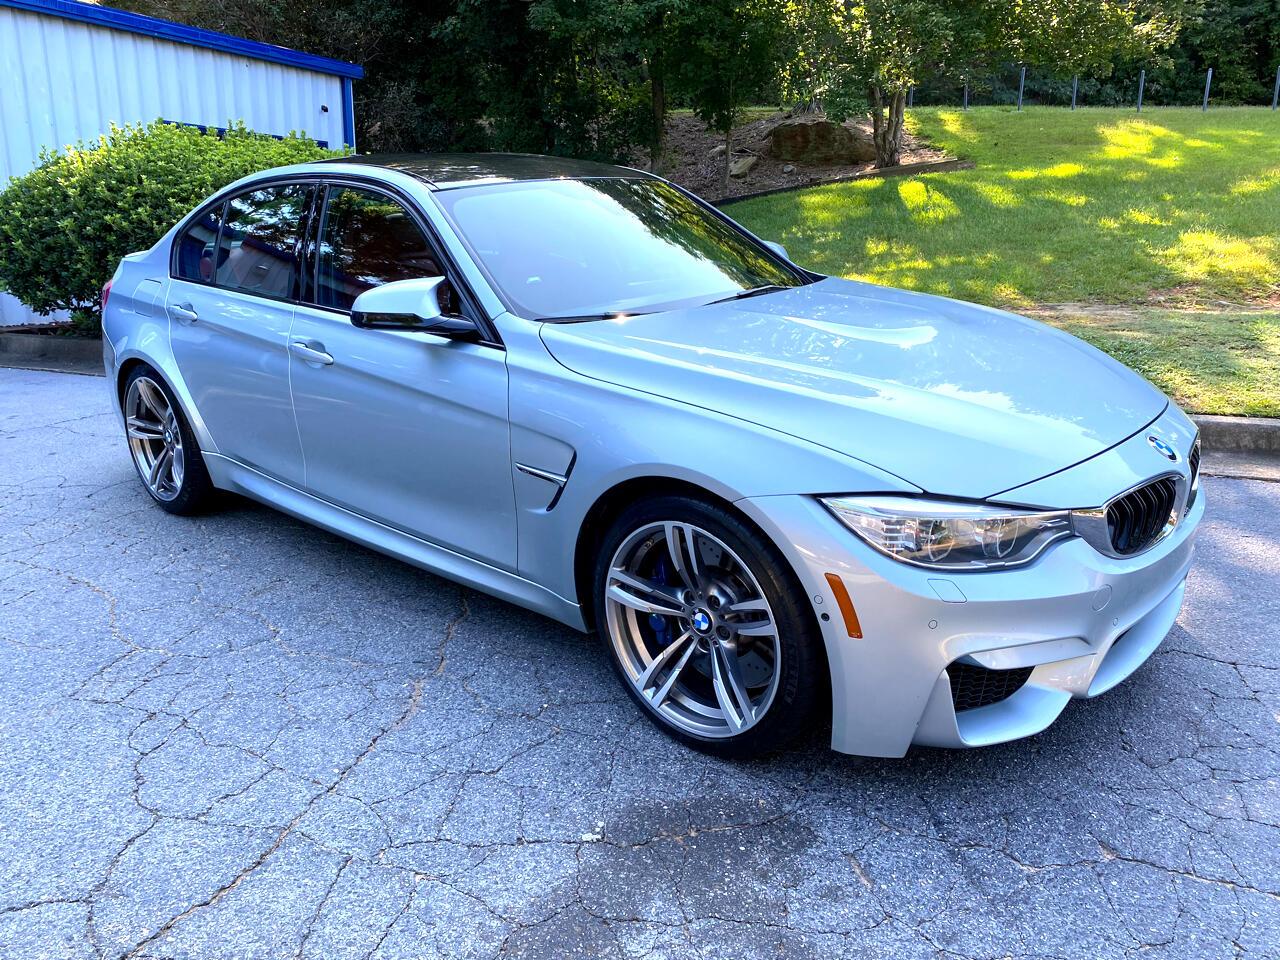 BMW M3 4dr Sdn 2015